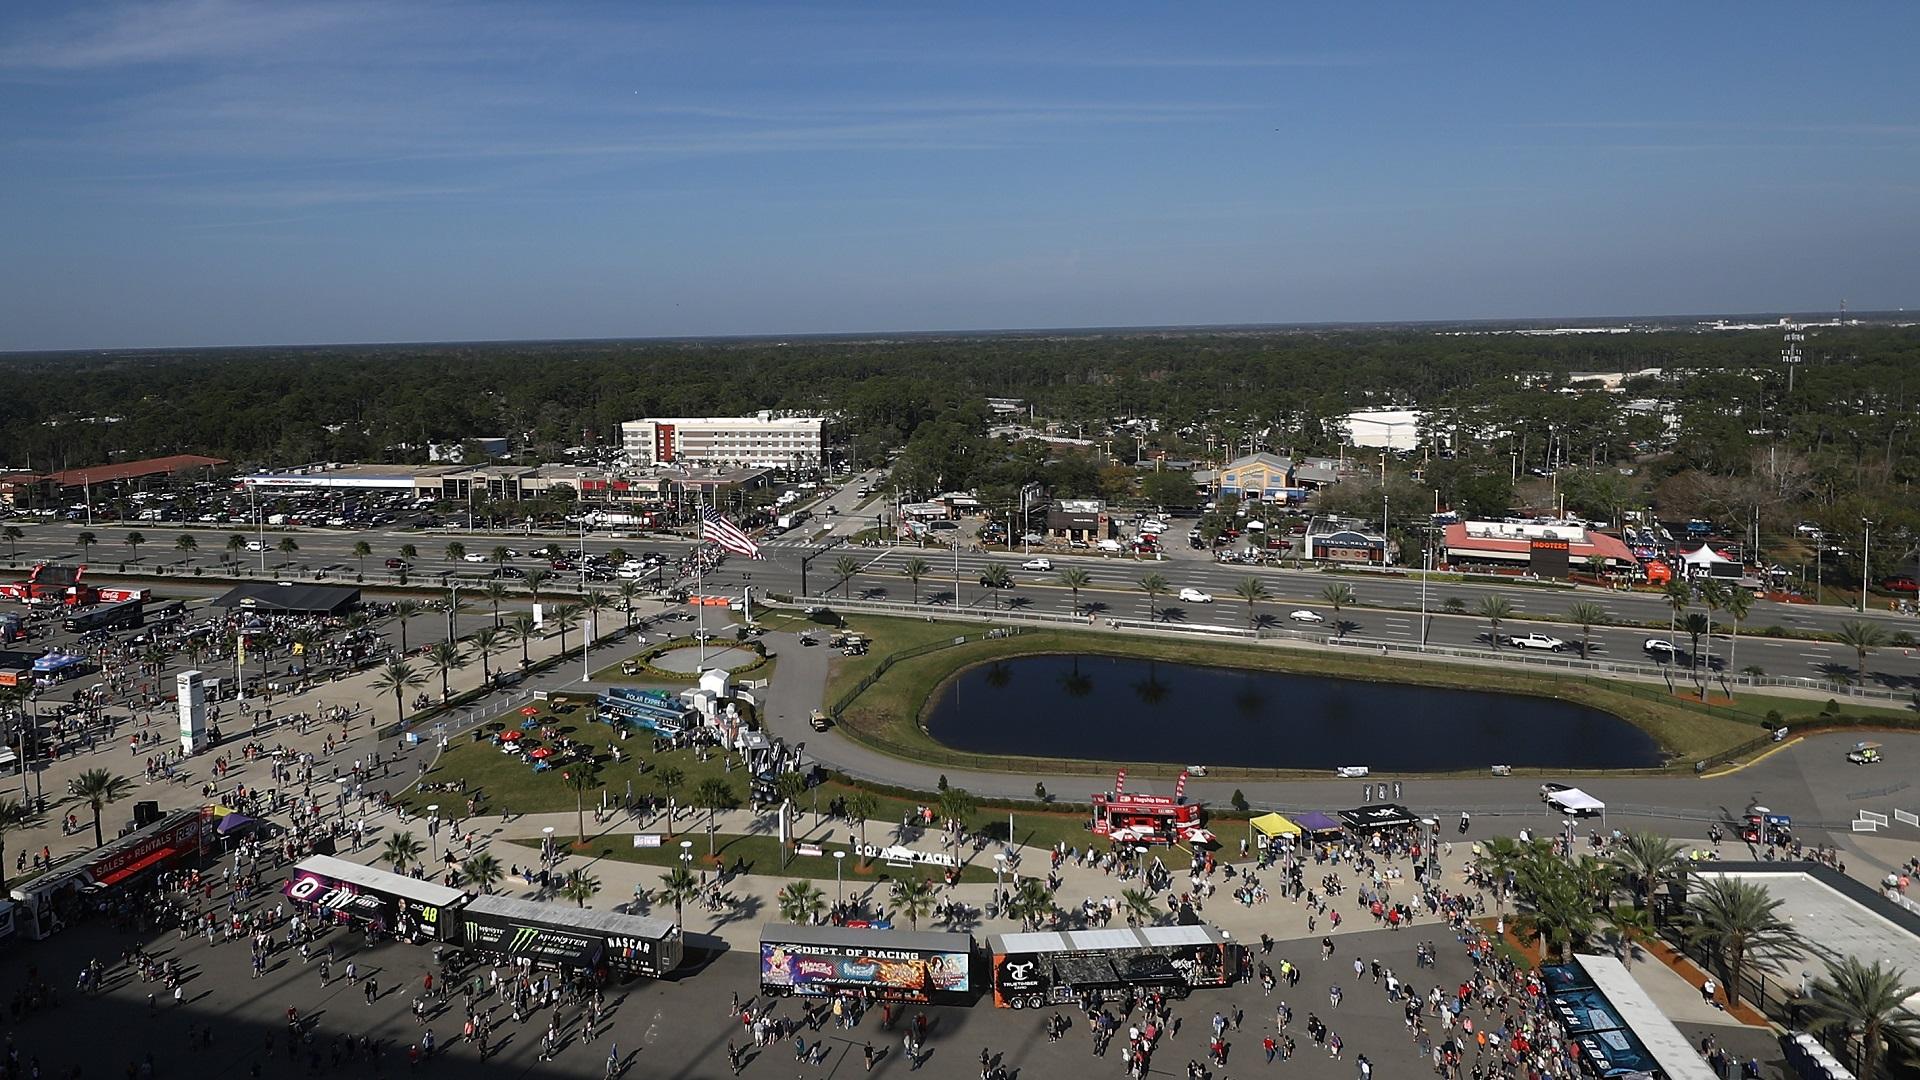 Daytona Speedway Midway